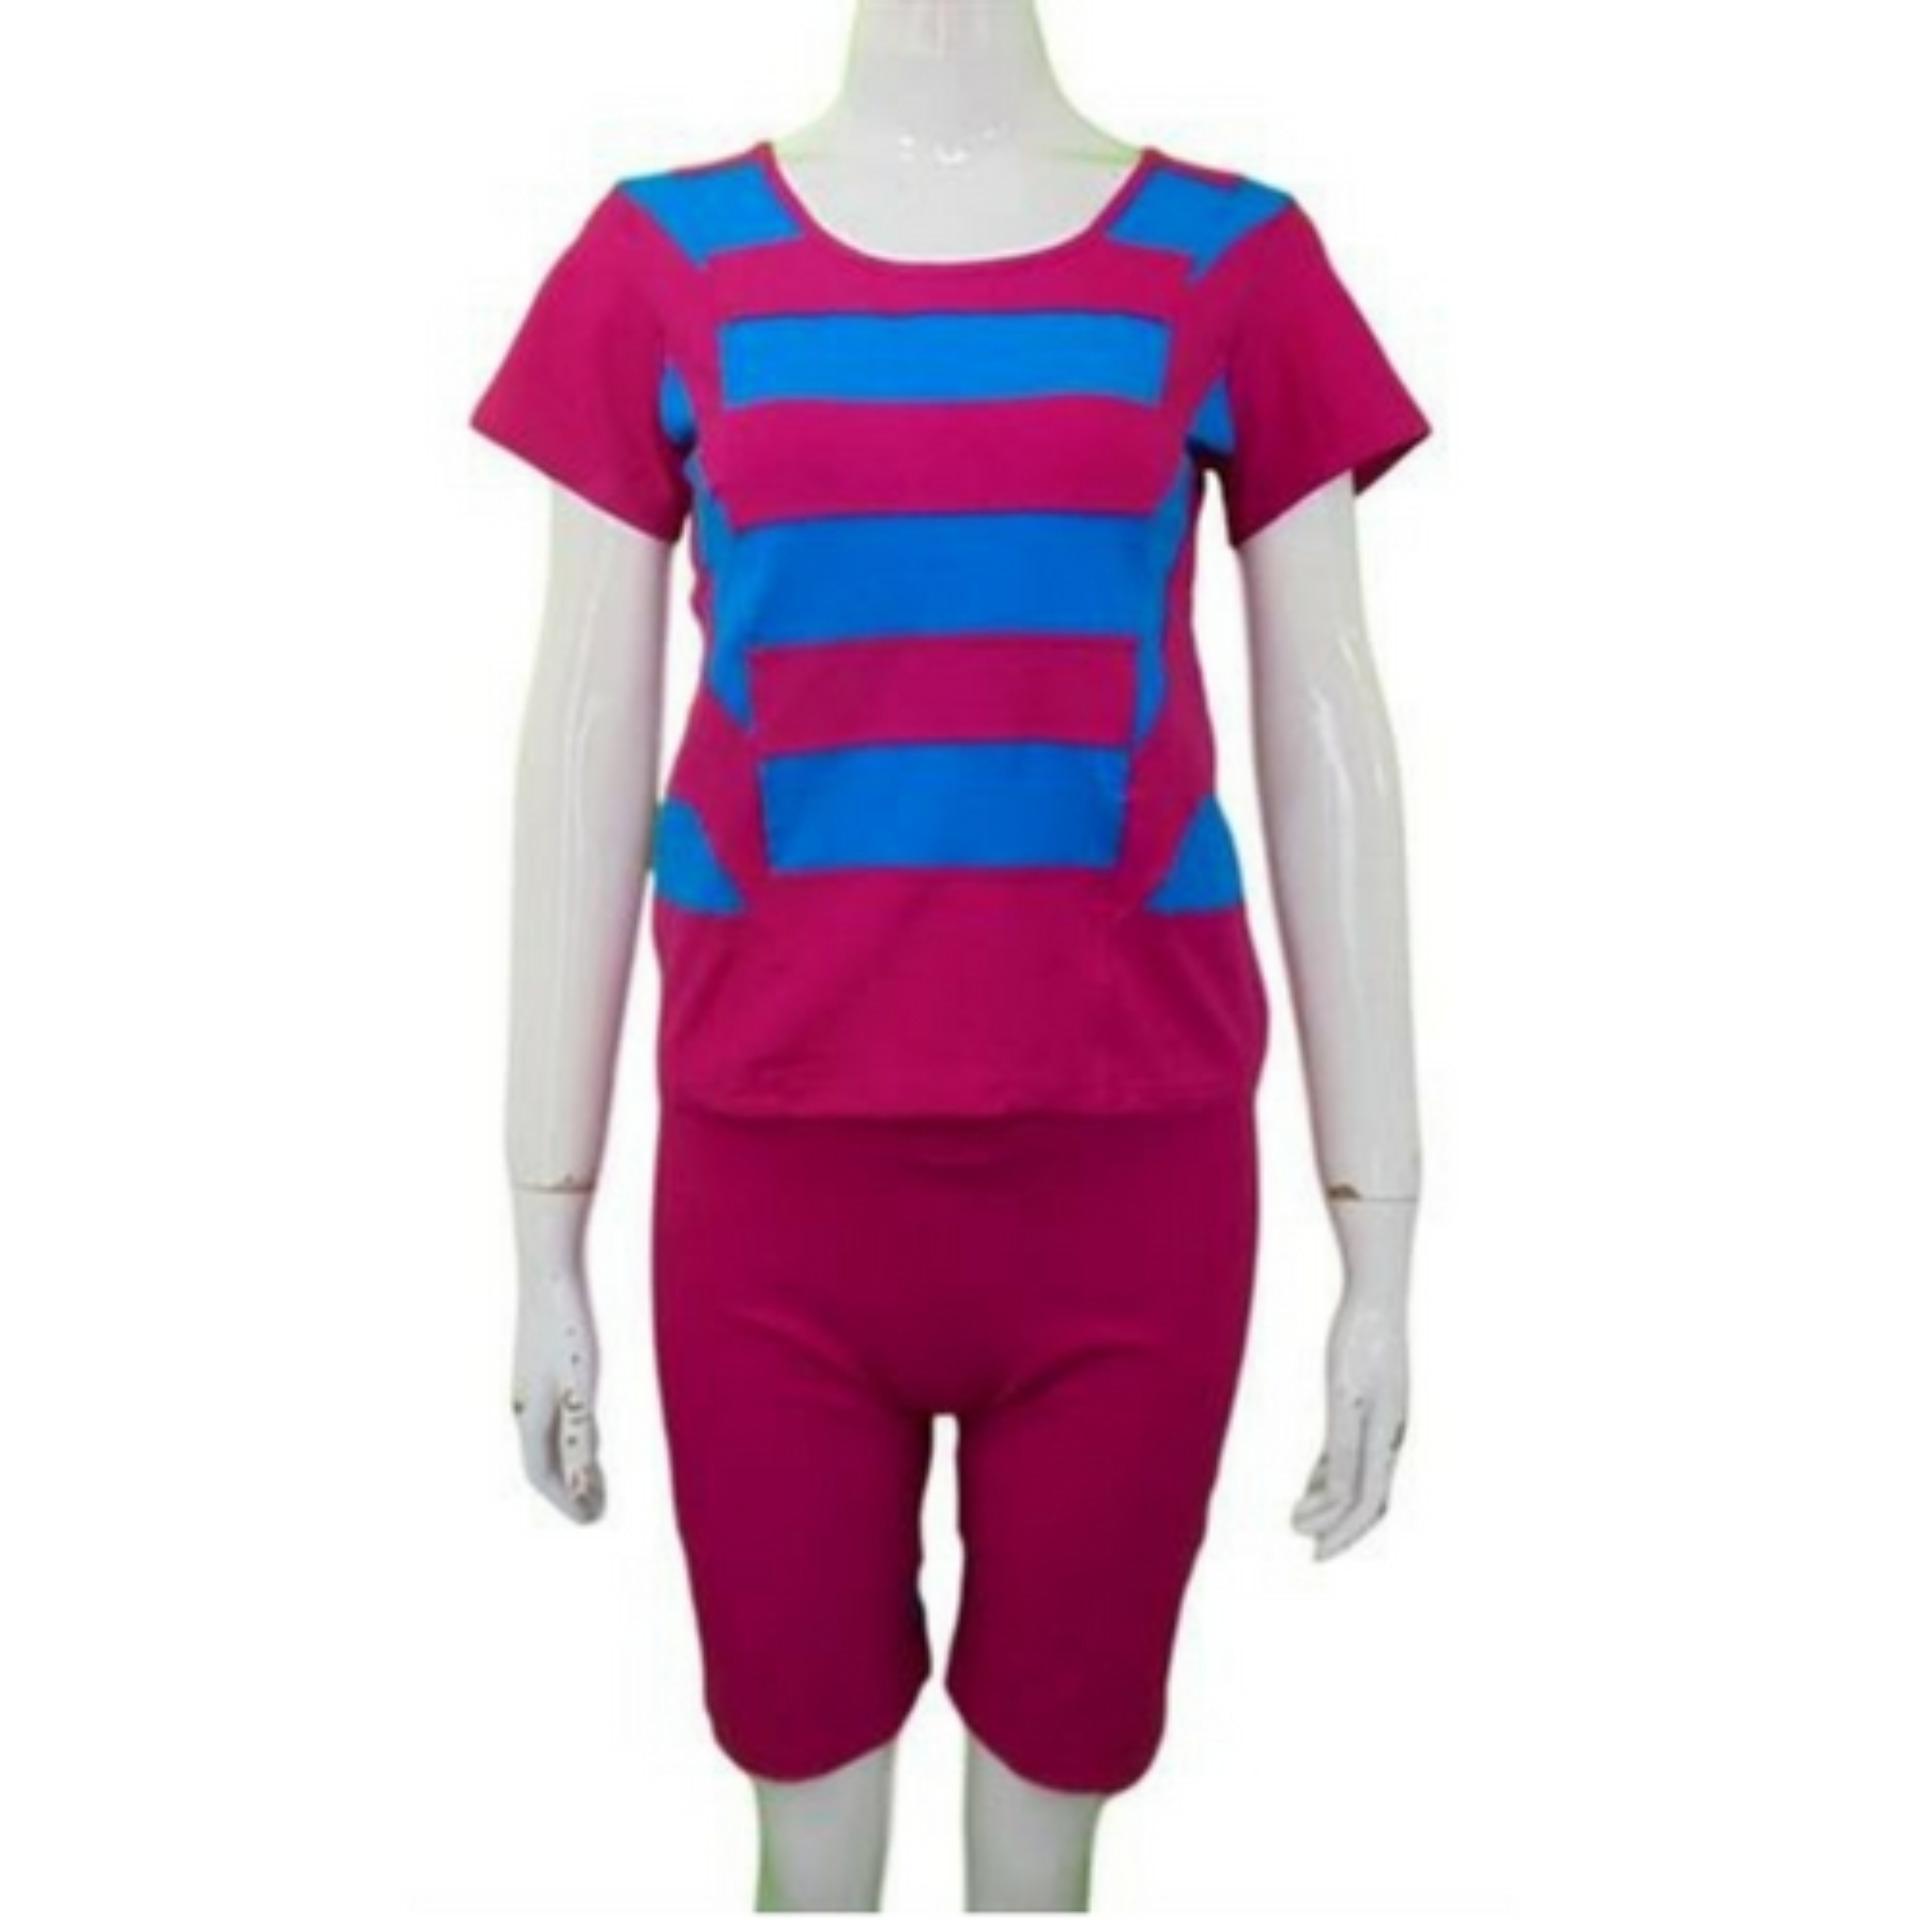 Kira Baju Olahraga Wanita / Baju Senam Wanita SY504-Pnk, XL .